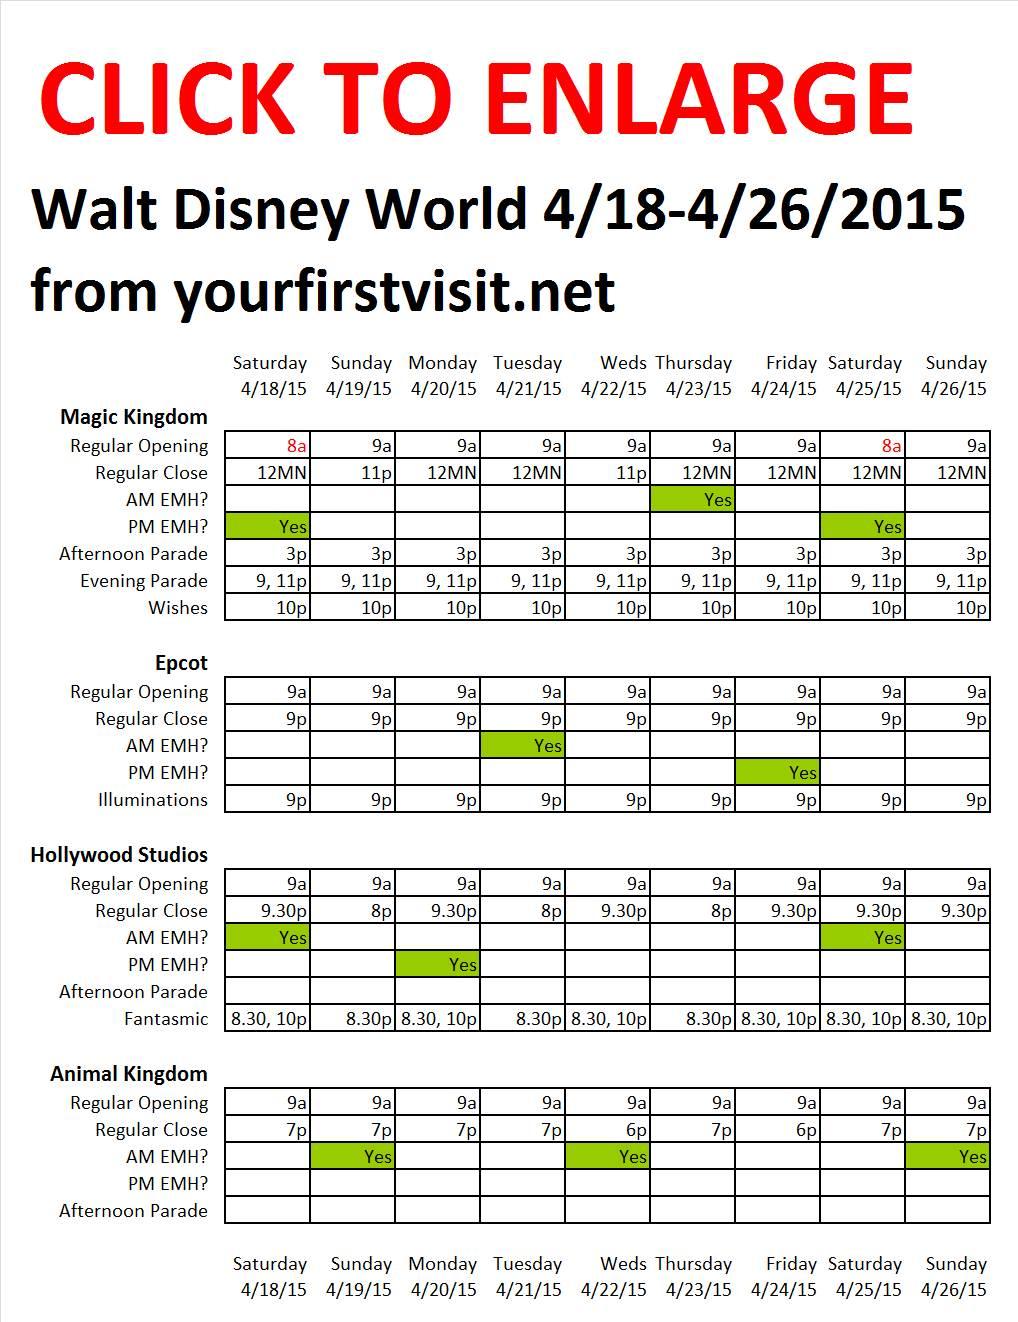 Disney World 4-18 to 4-26-2015 from yourfirstvisit.net